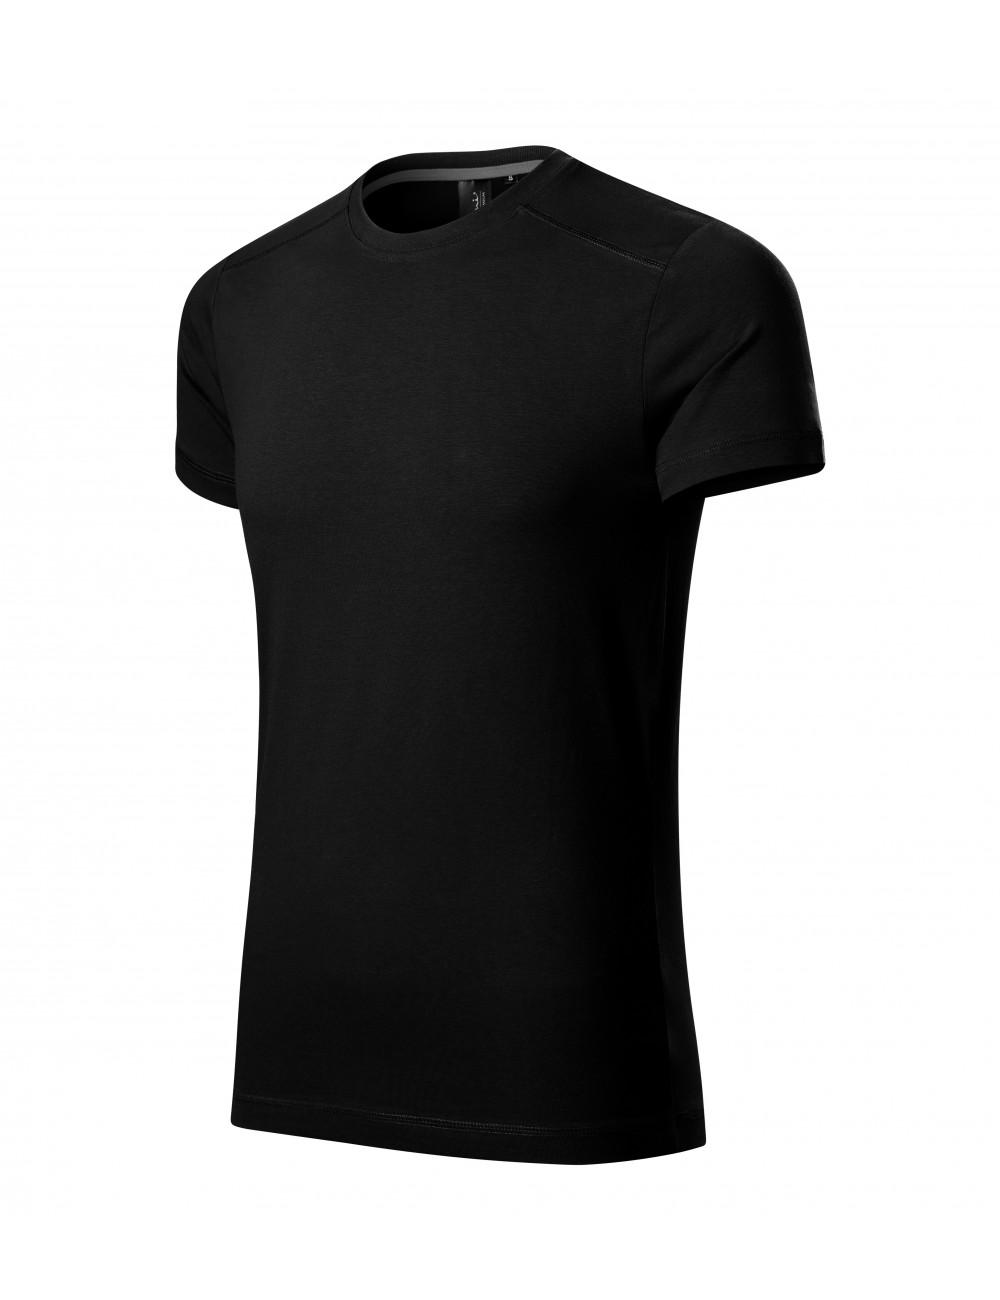 Adler MALFINIPREMIUM Koszulka męska Action 150 czarny